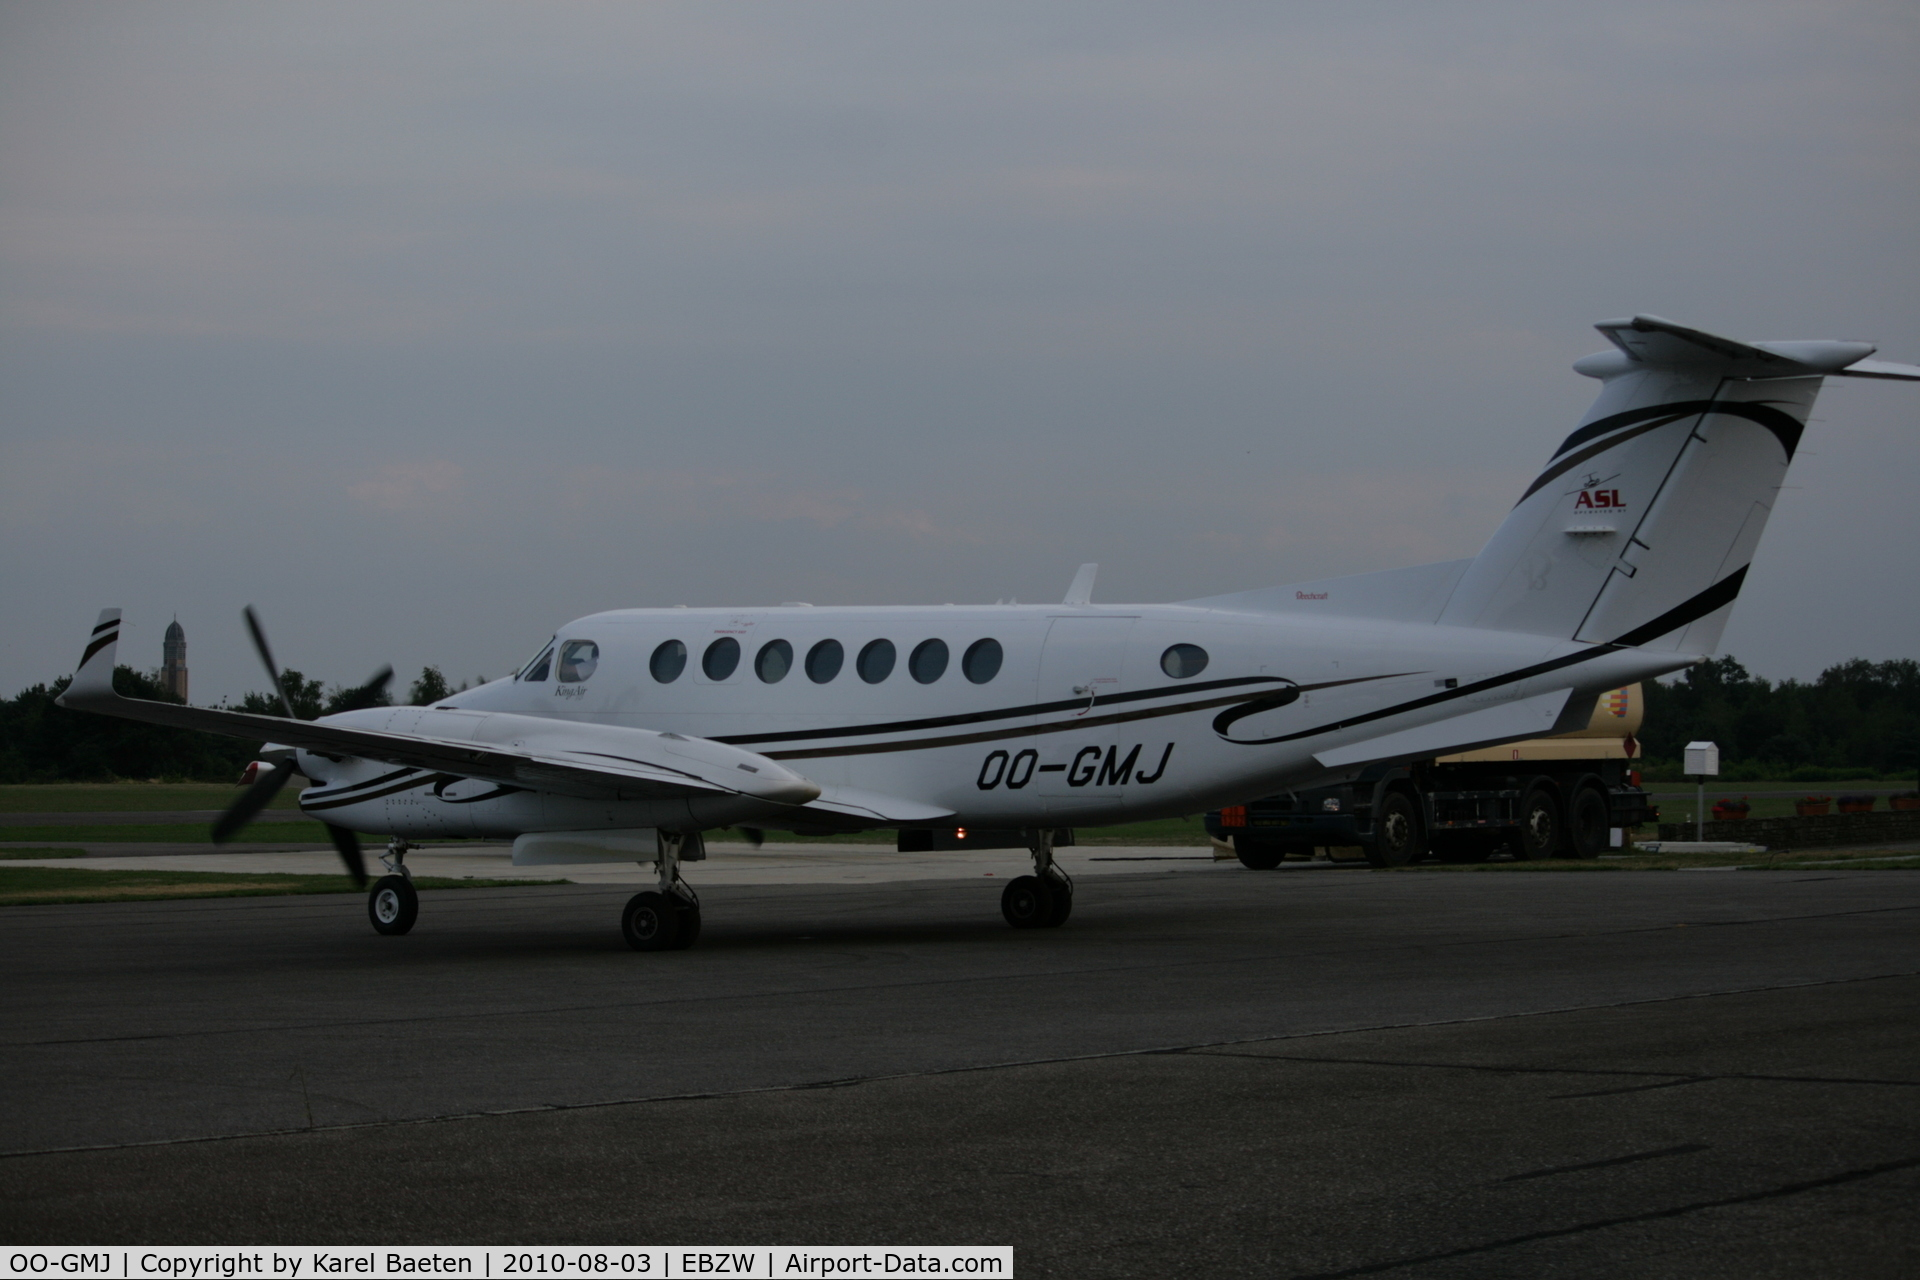 OO-GMJ, 2005 Beechcraft King Air 350B C/N FL-460, maintenance@EBZW